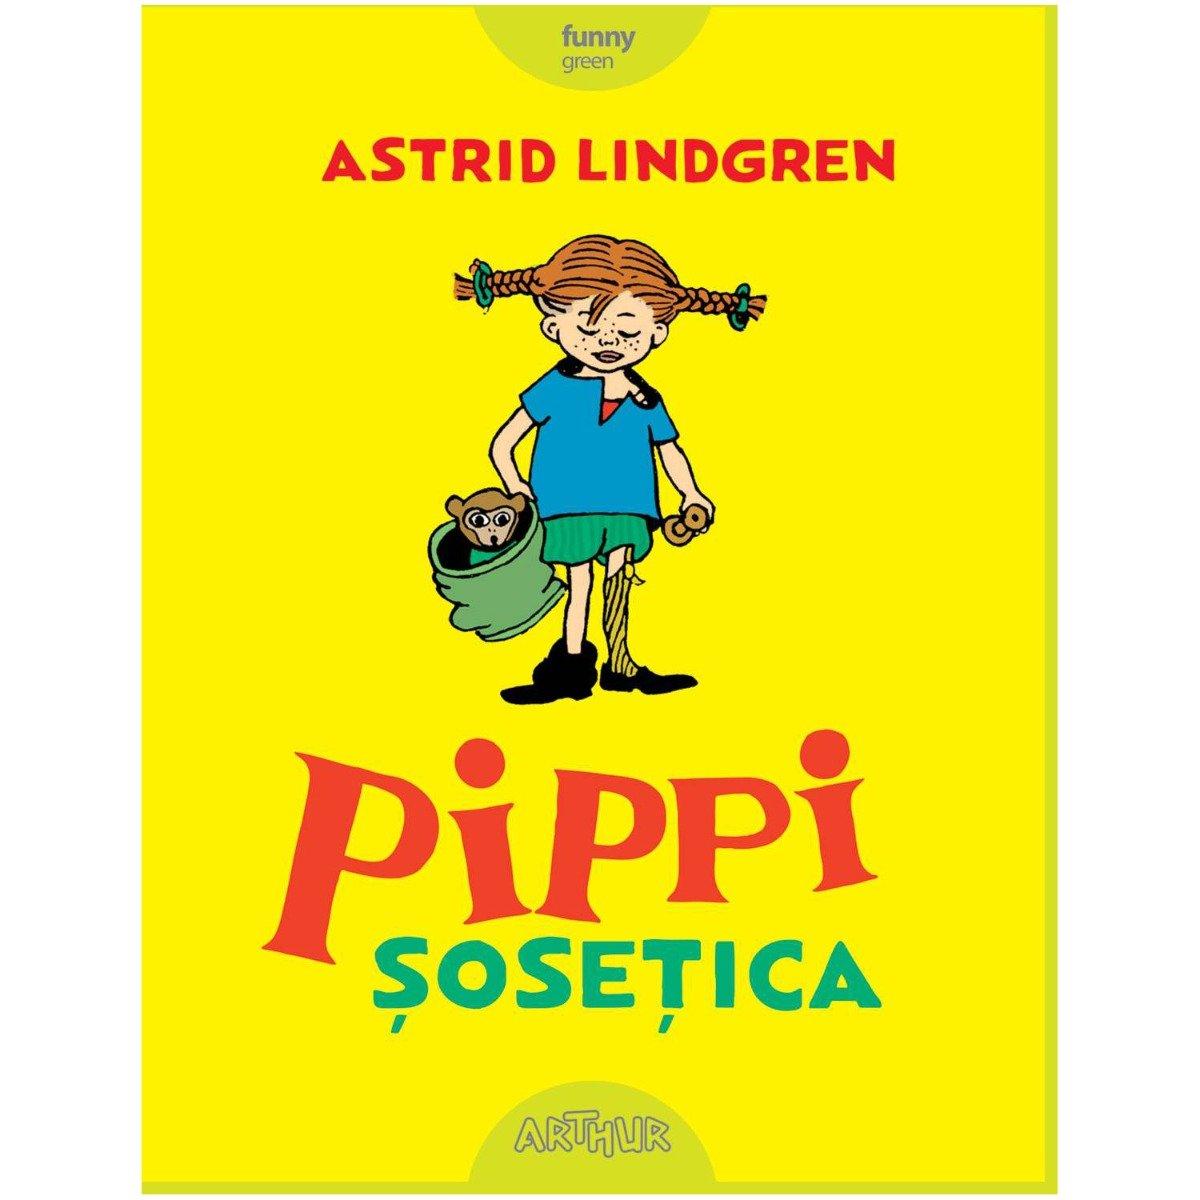 Carte Editura Arthur - Pippi Sosetica, Astrid Lindgren